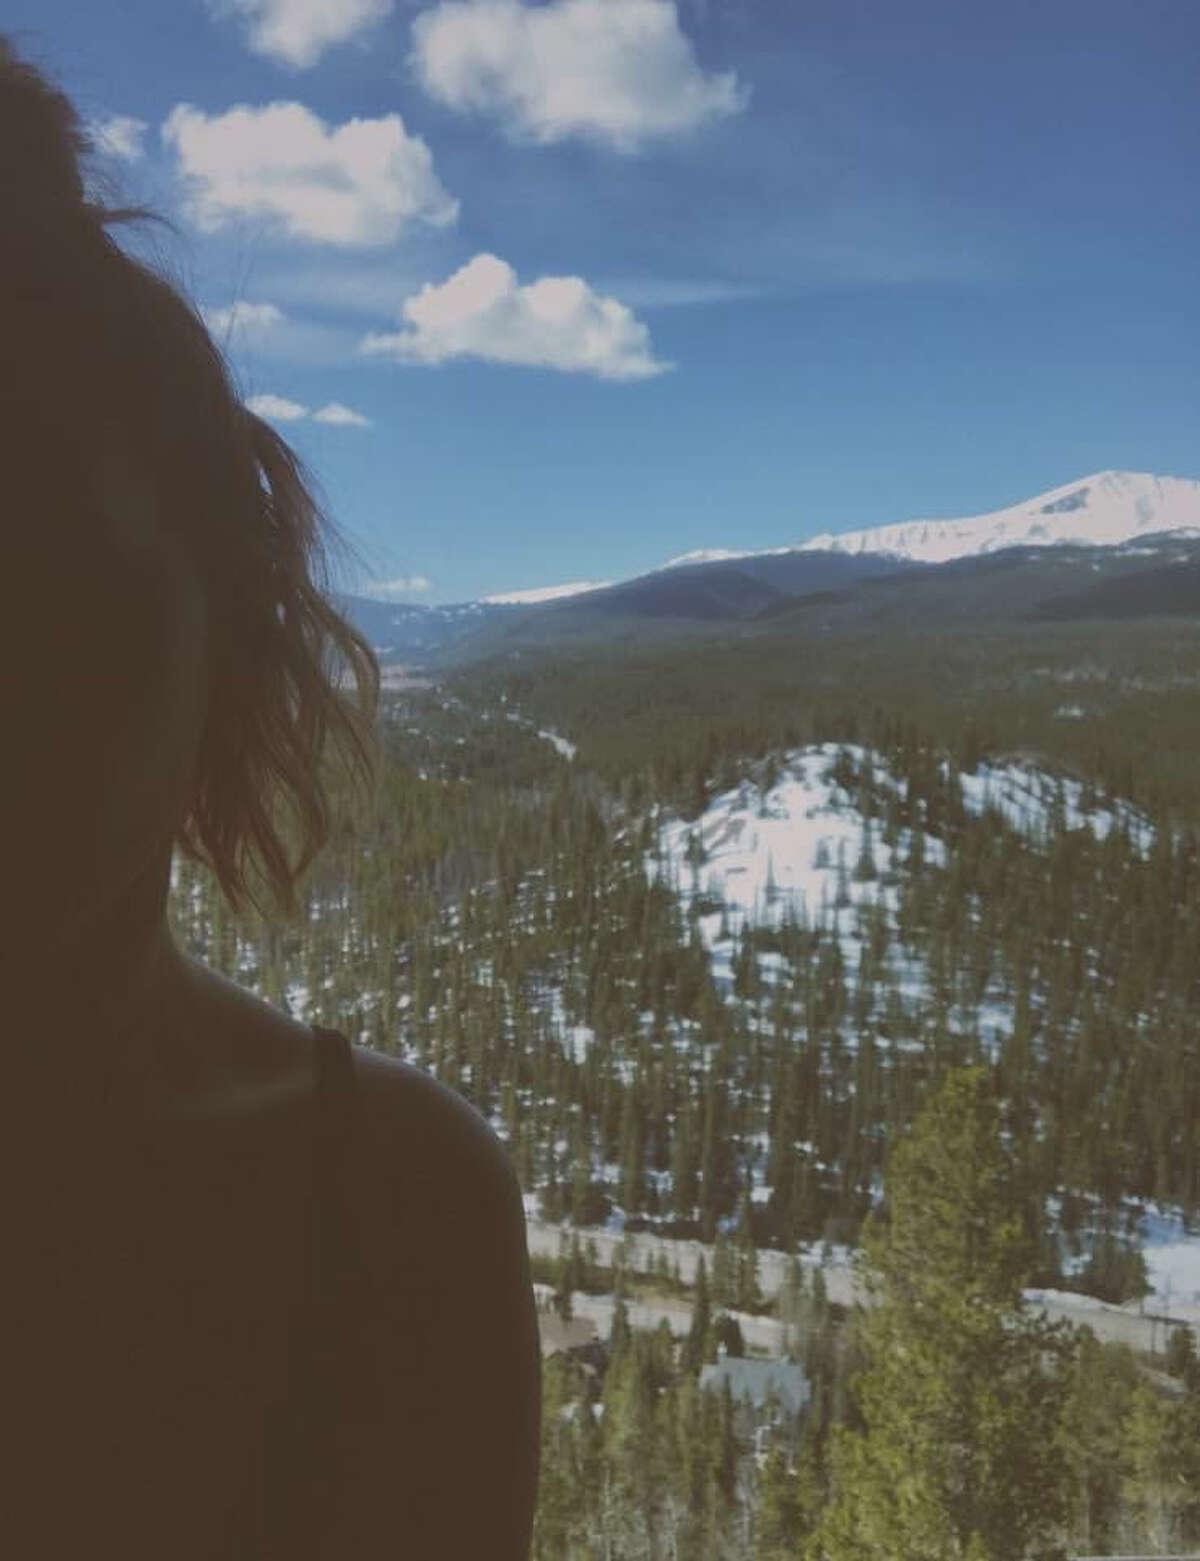 3. I spent my early twenties living in Denver, Colorado.